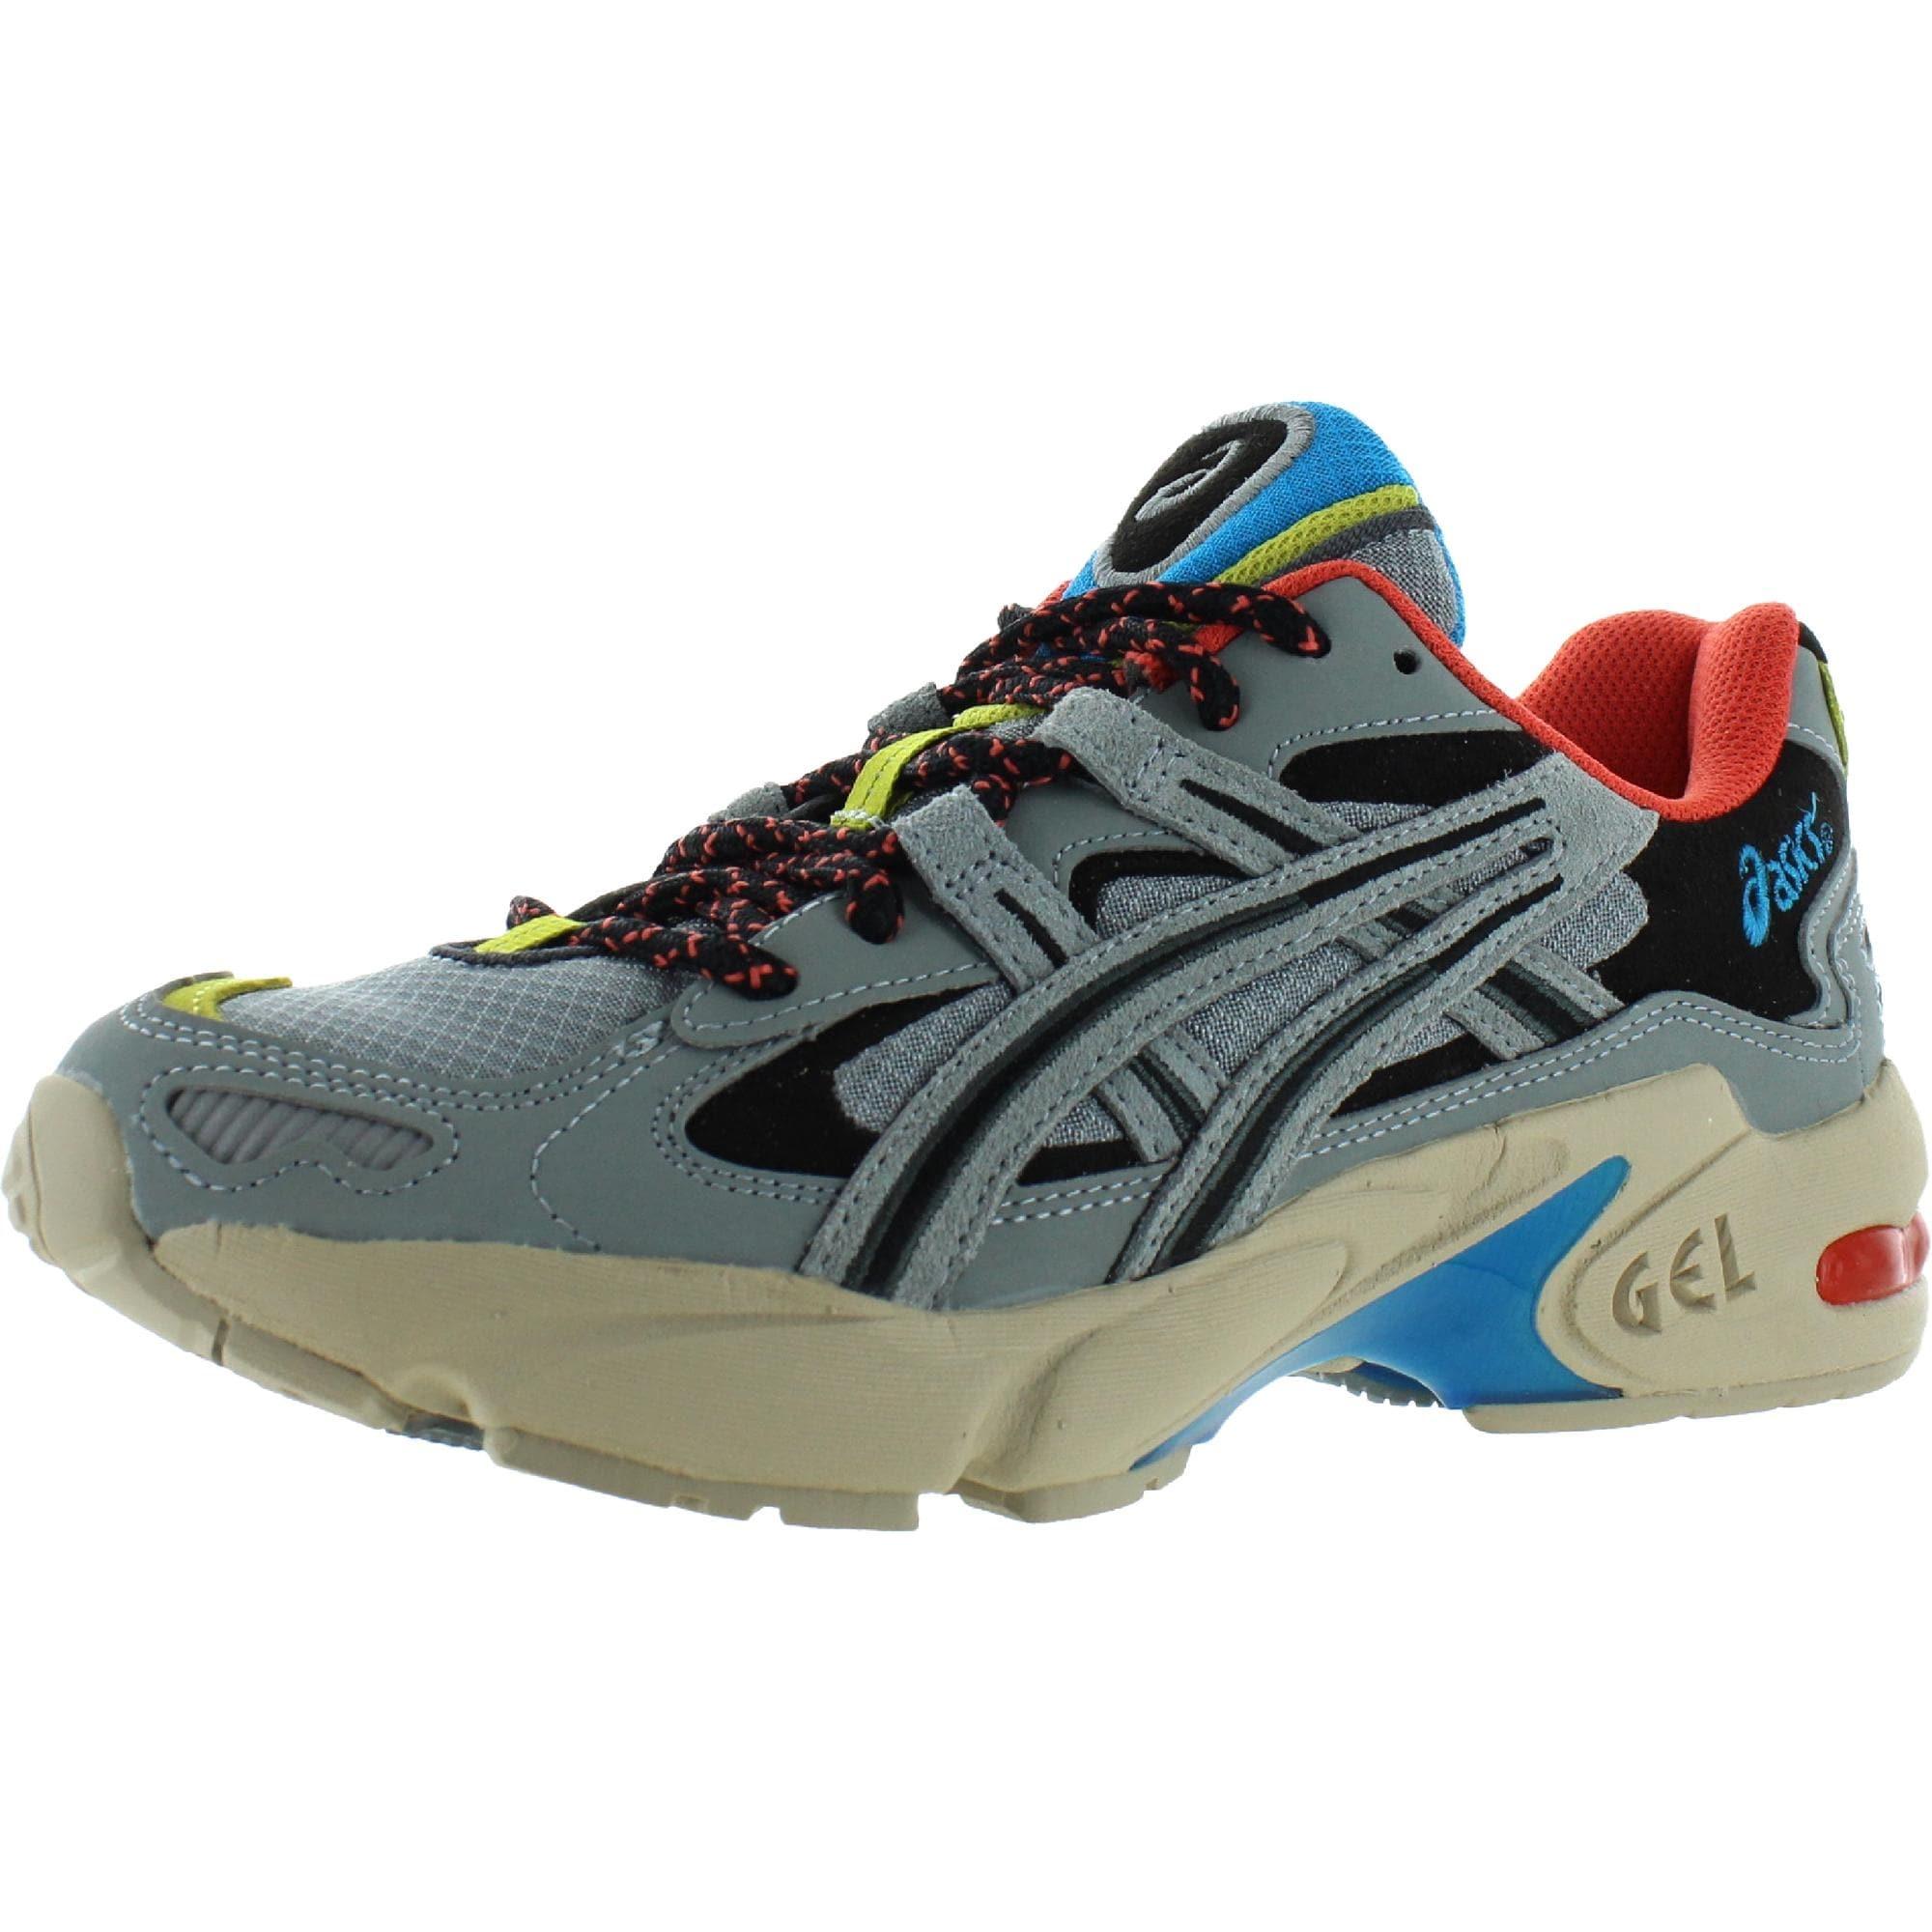 Shop Asics Womens GEL-Kayano 5 Sneakers